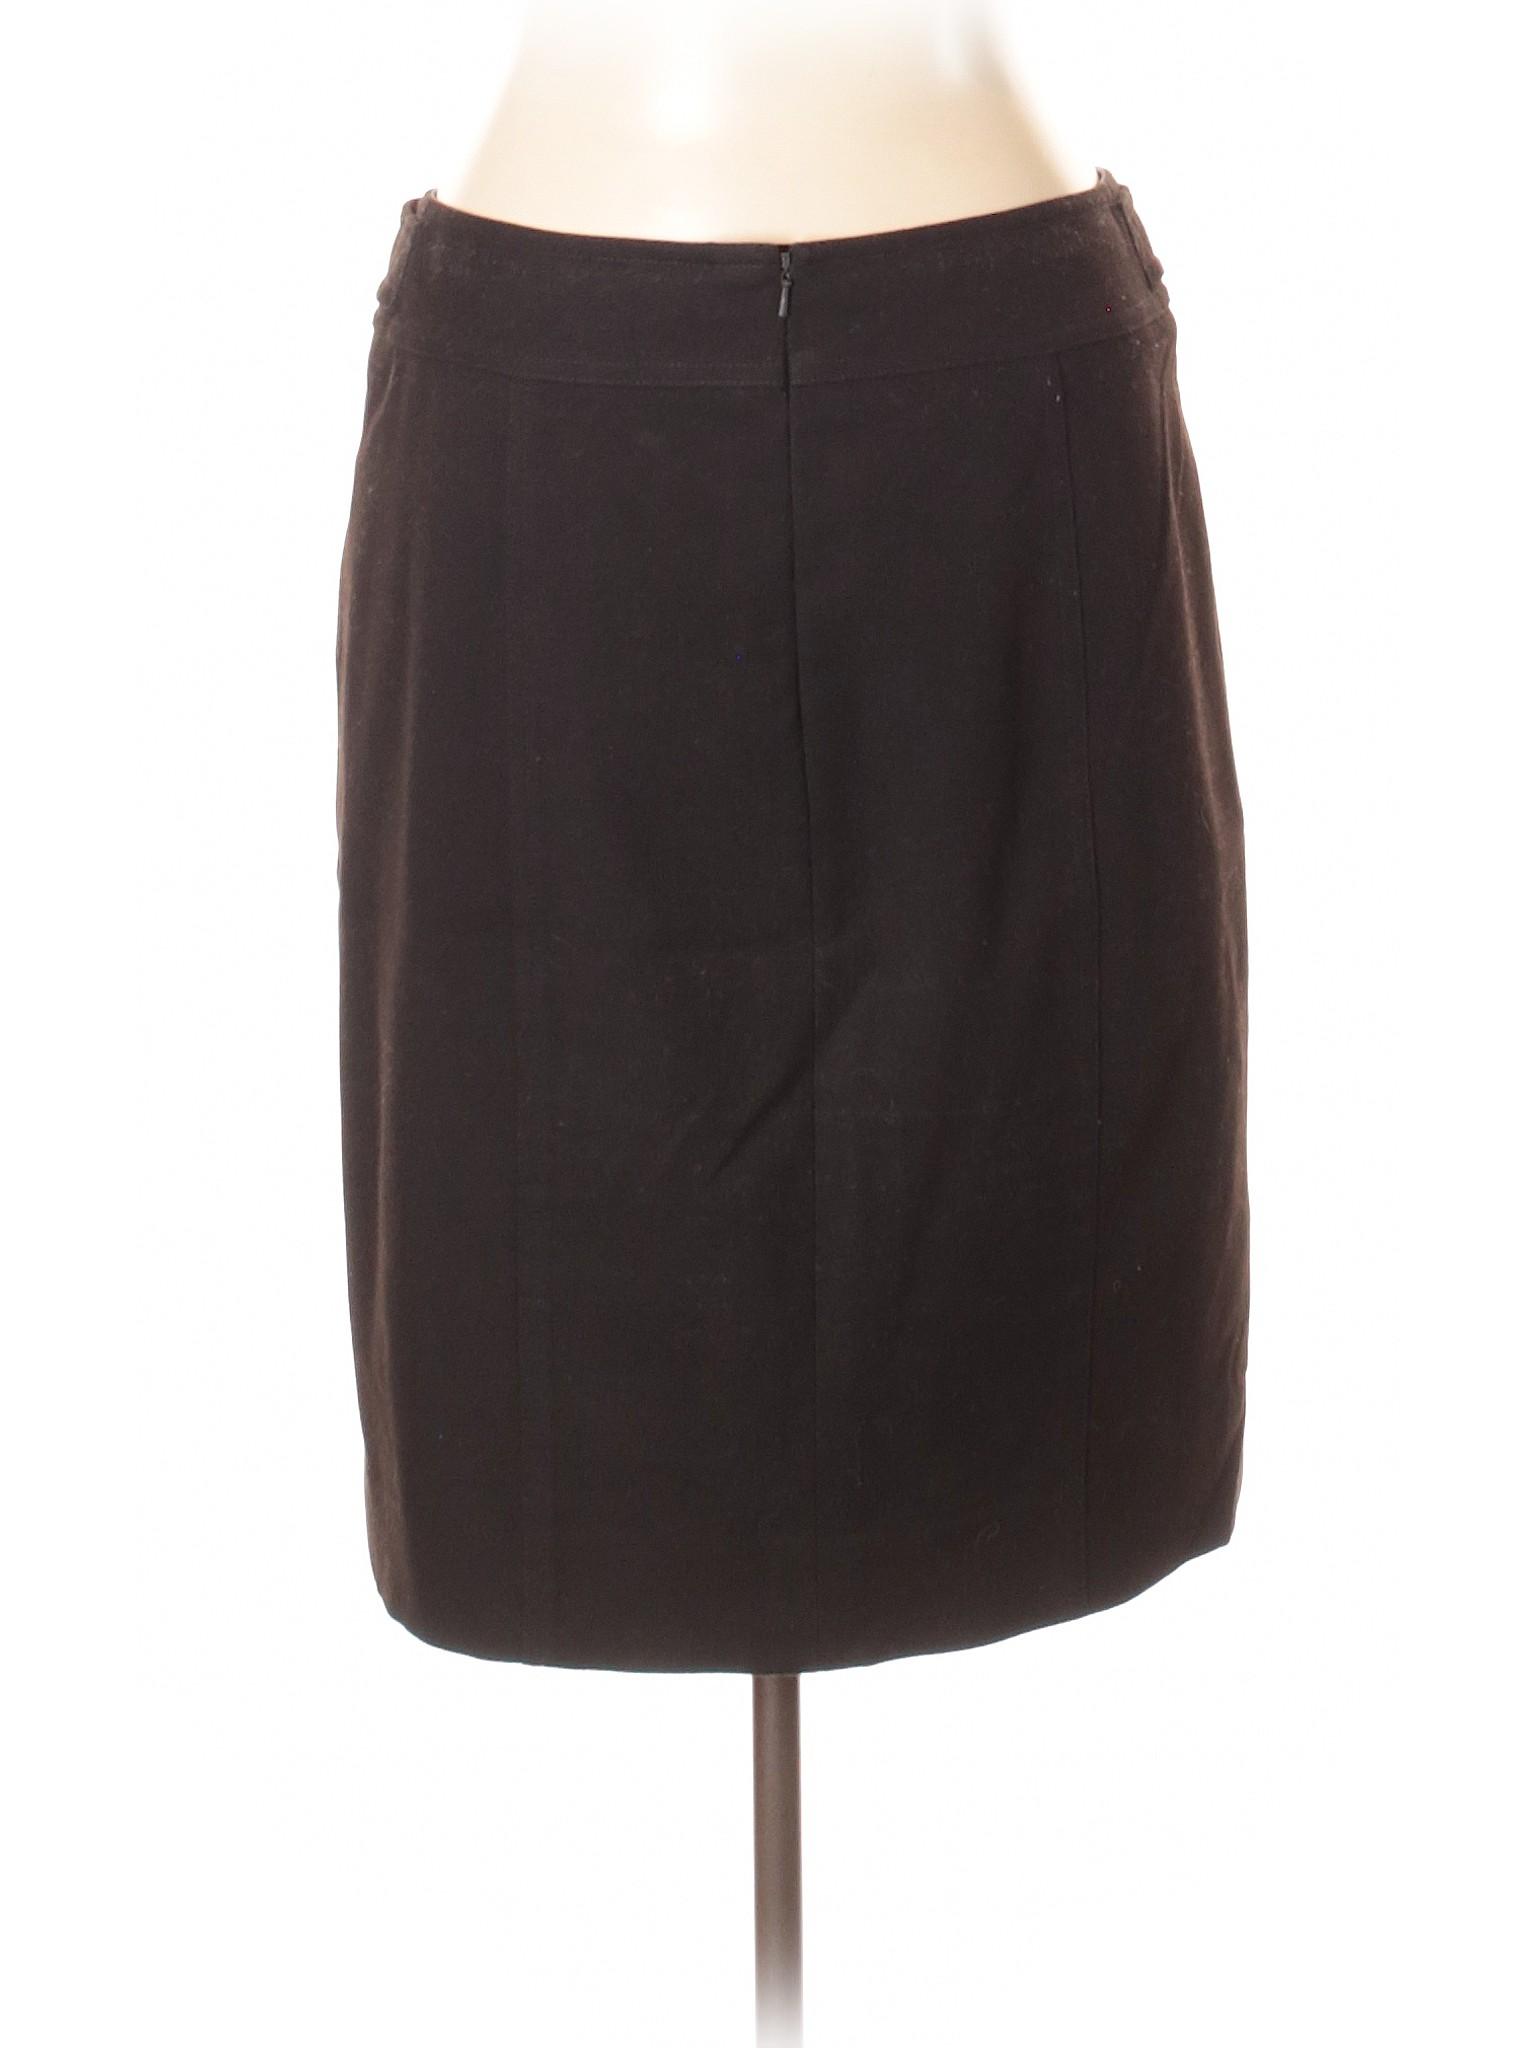 Boutique Casual Boutique Skirt Boutique Skirt Skirt Casual Boutique Casual OAqIZRYnx